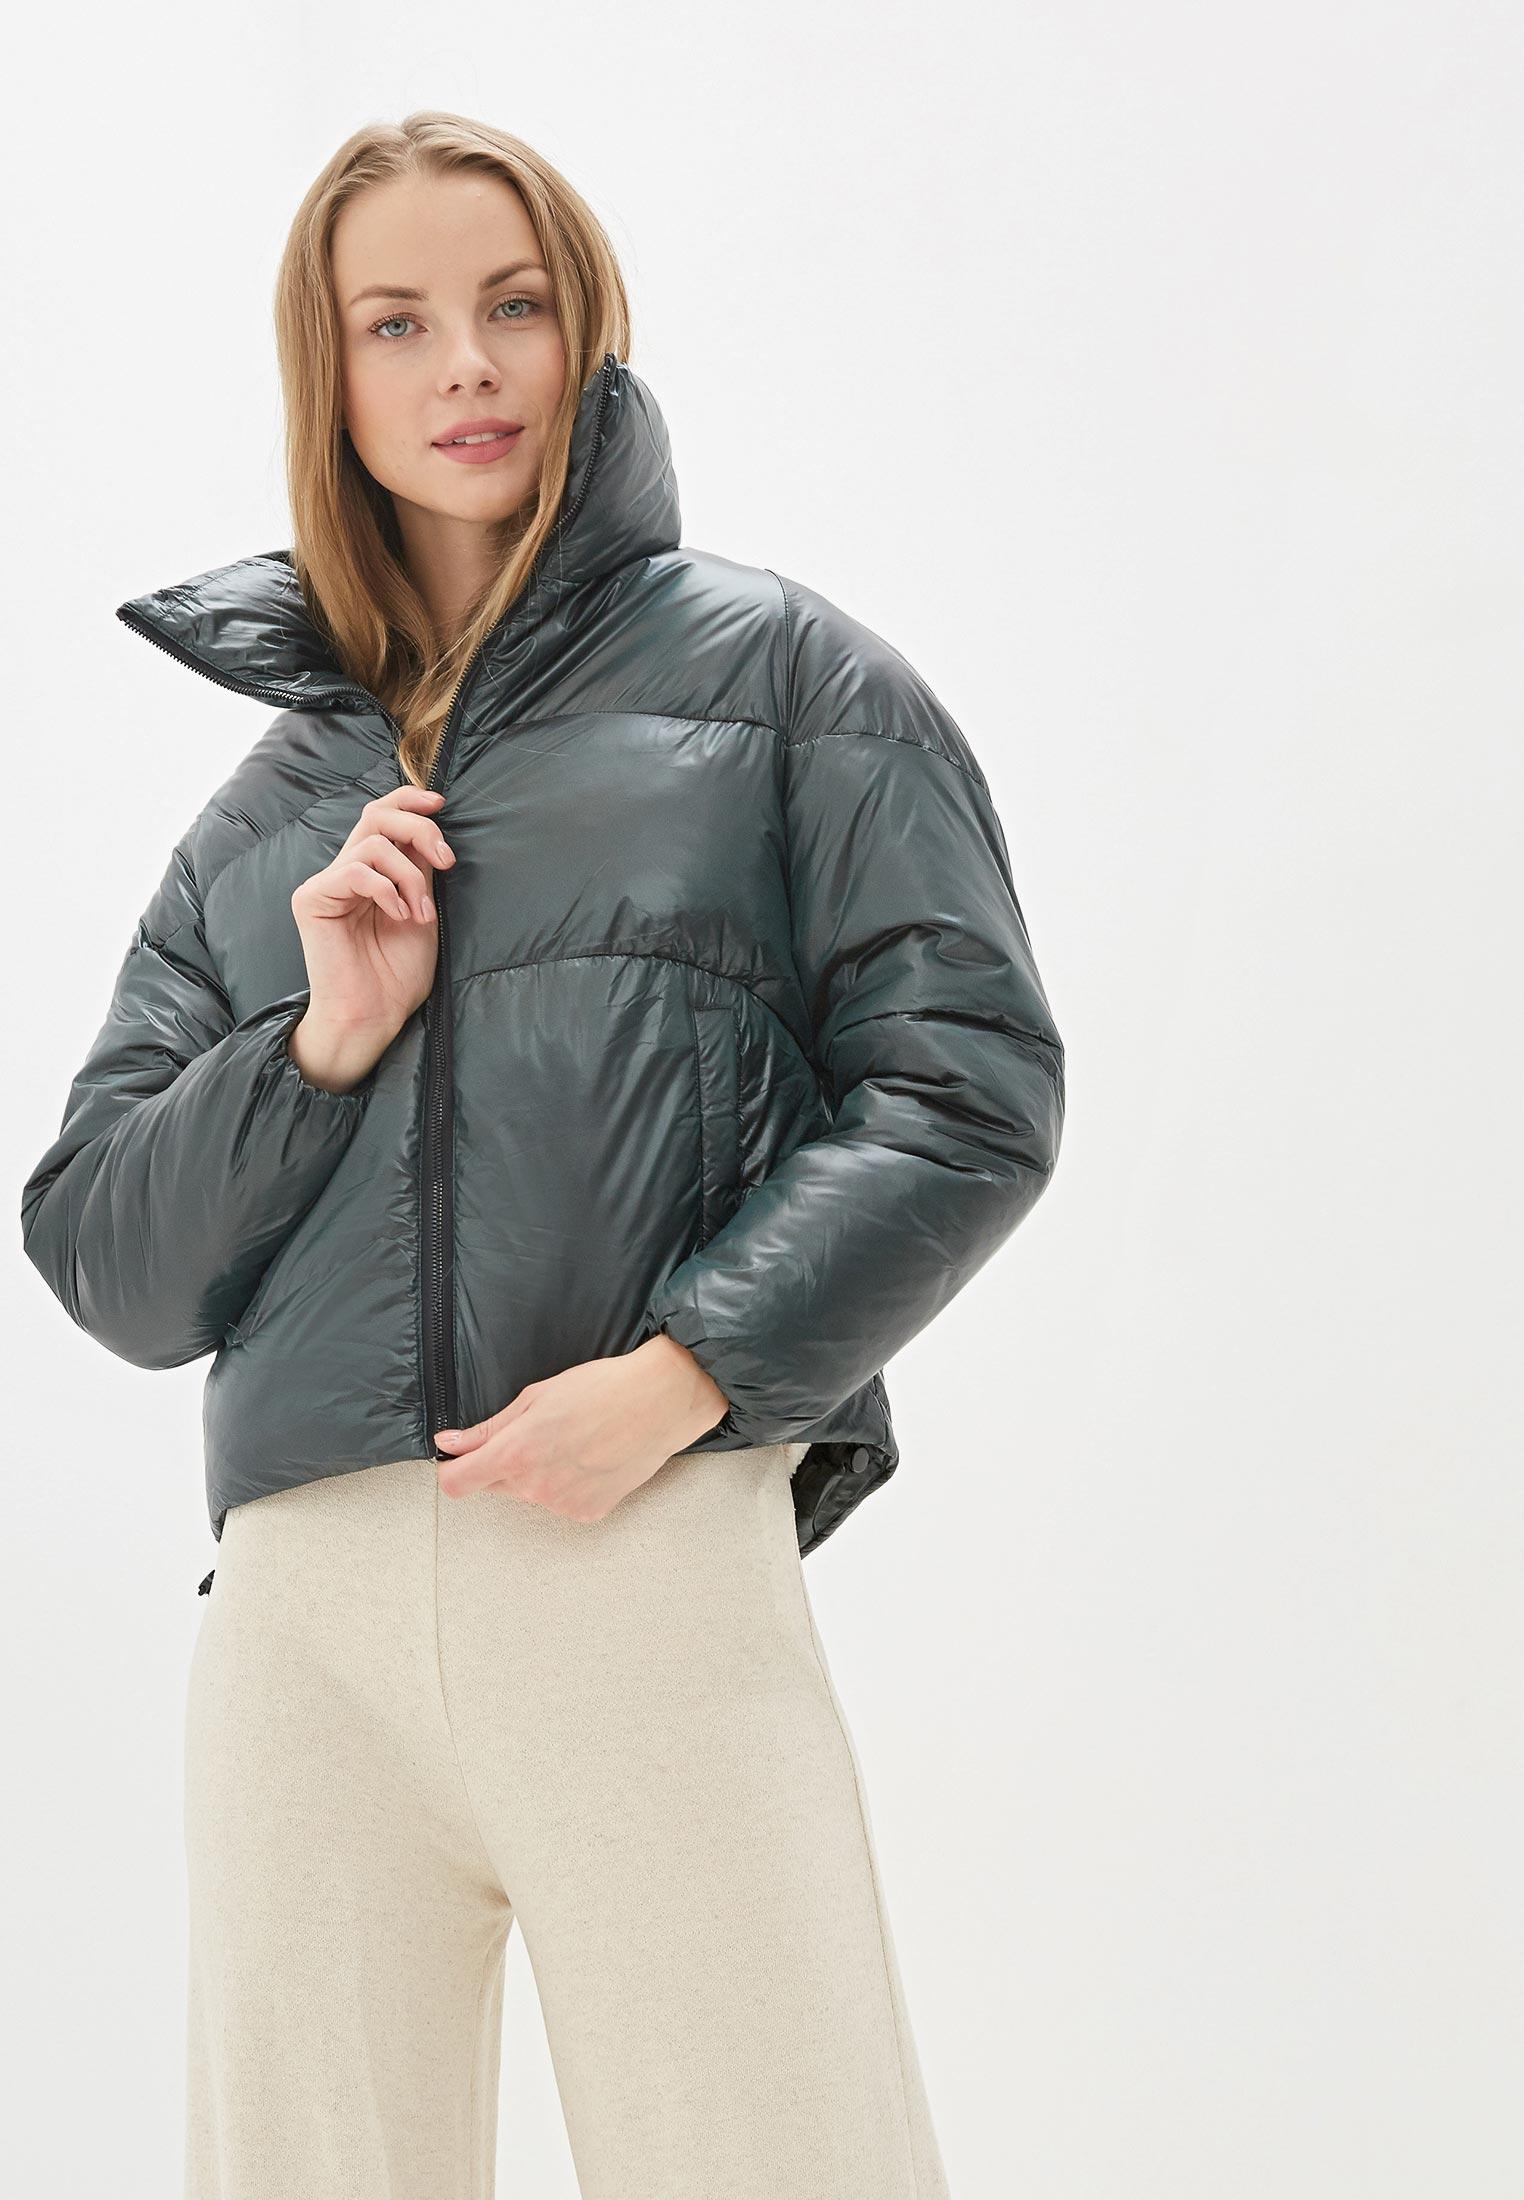 Куртка утепленная, Keddo, цвет: зеленый. Артикул: MP002XW11Y0P. Одежда / Верхняя одежда